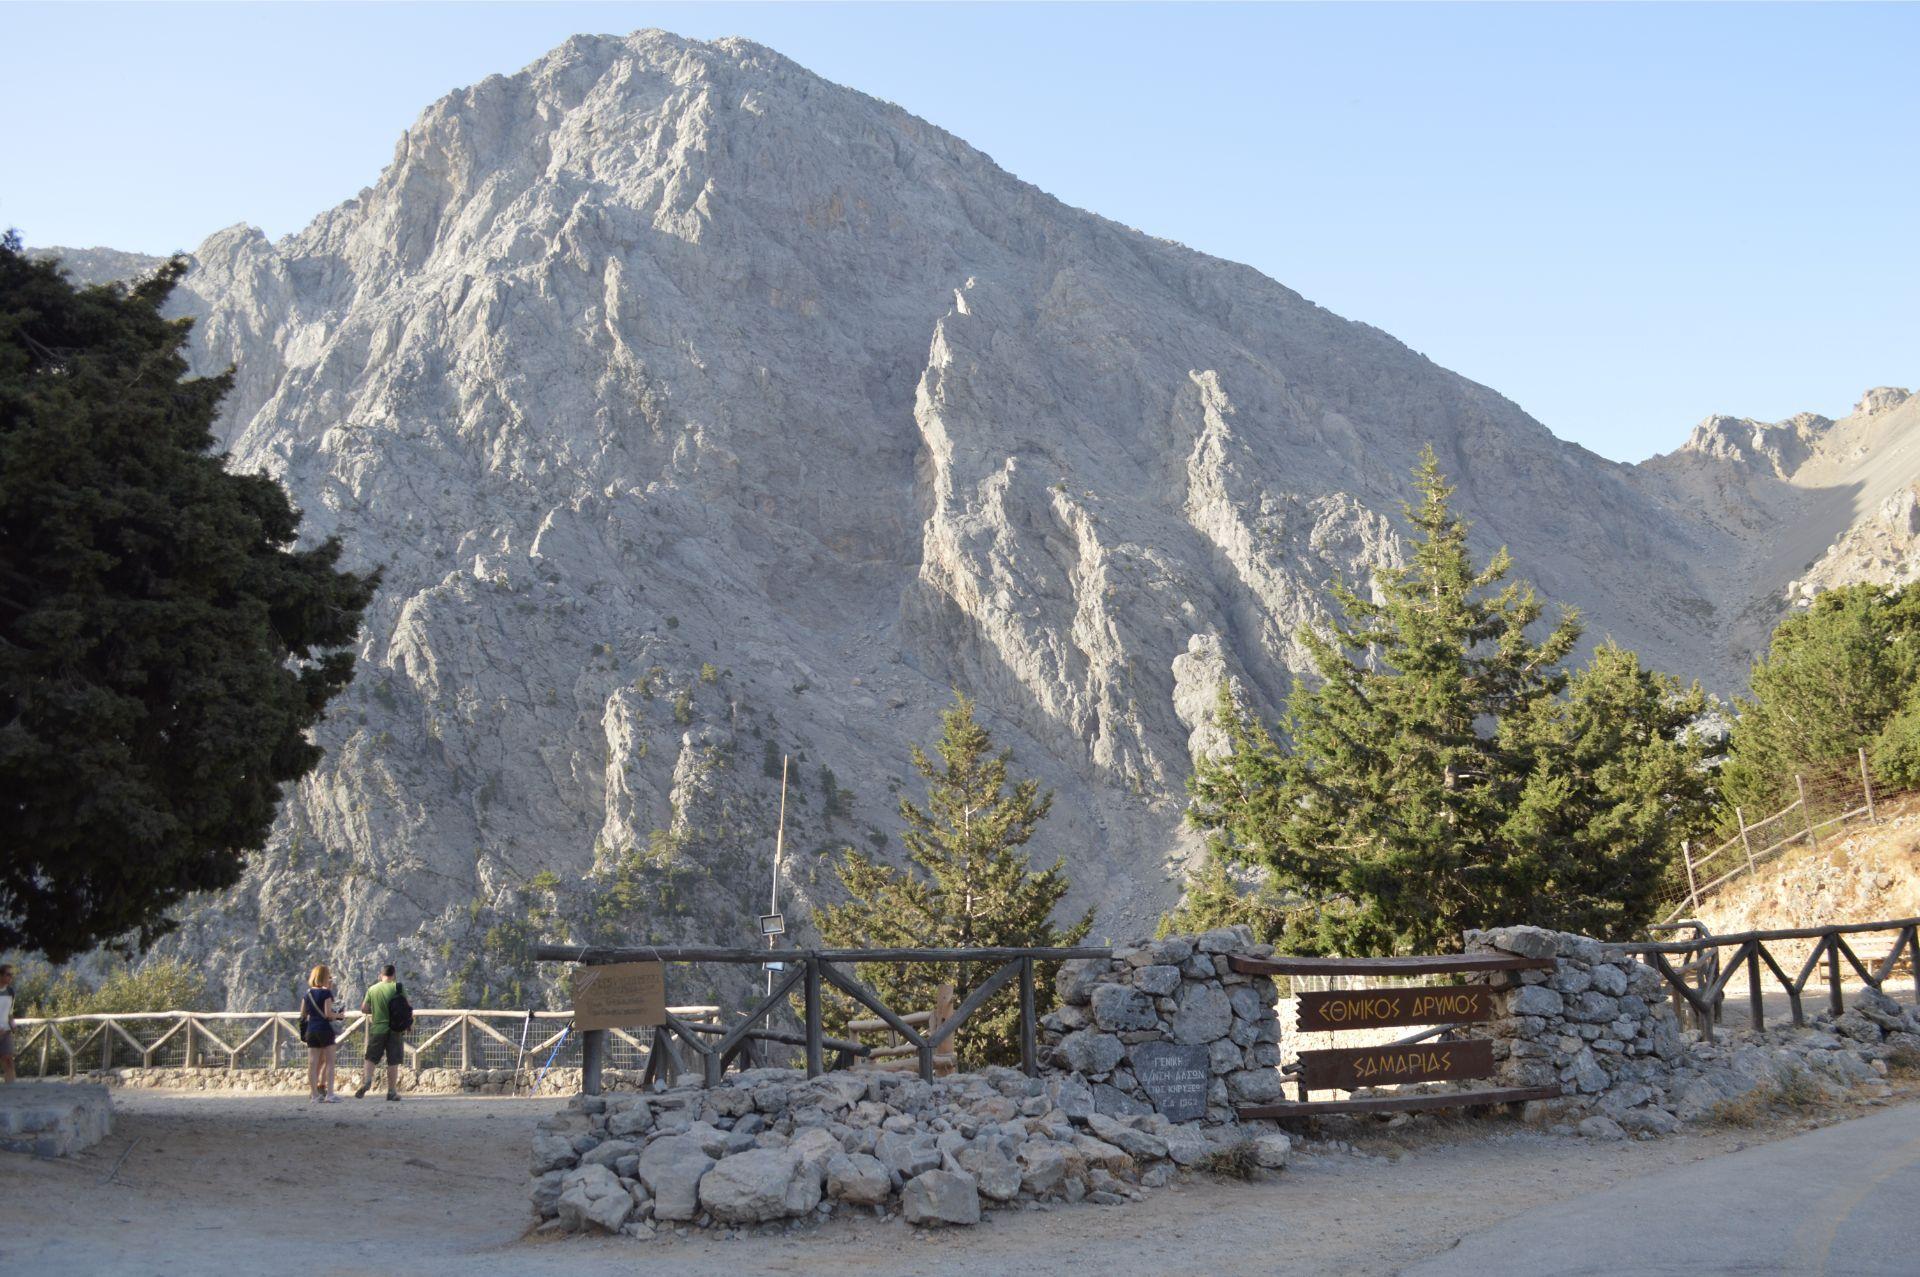 Voidodema Omalos Samaria_Evenos_Travel_2_day_hiking_trip__gorge_2day_0